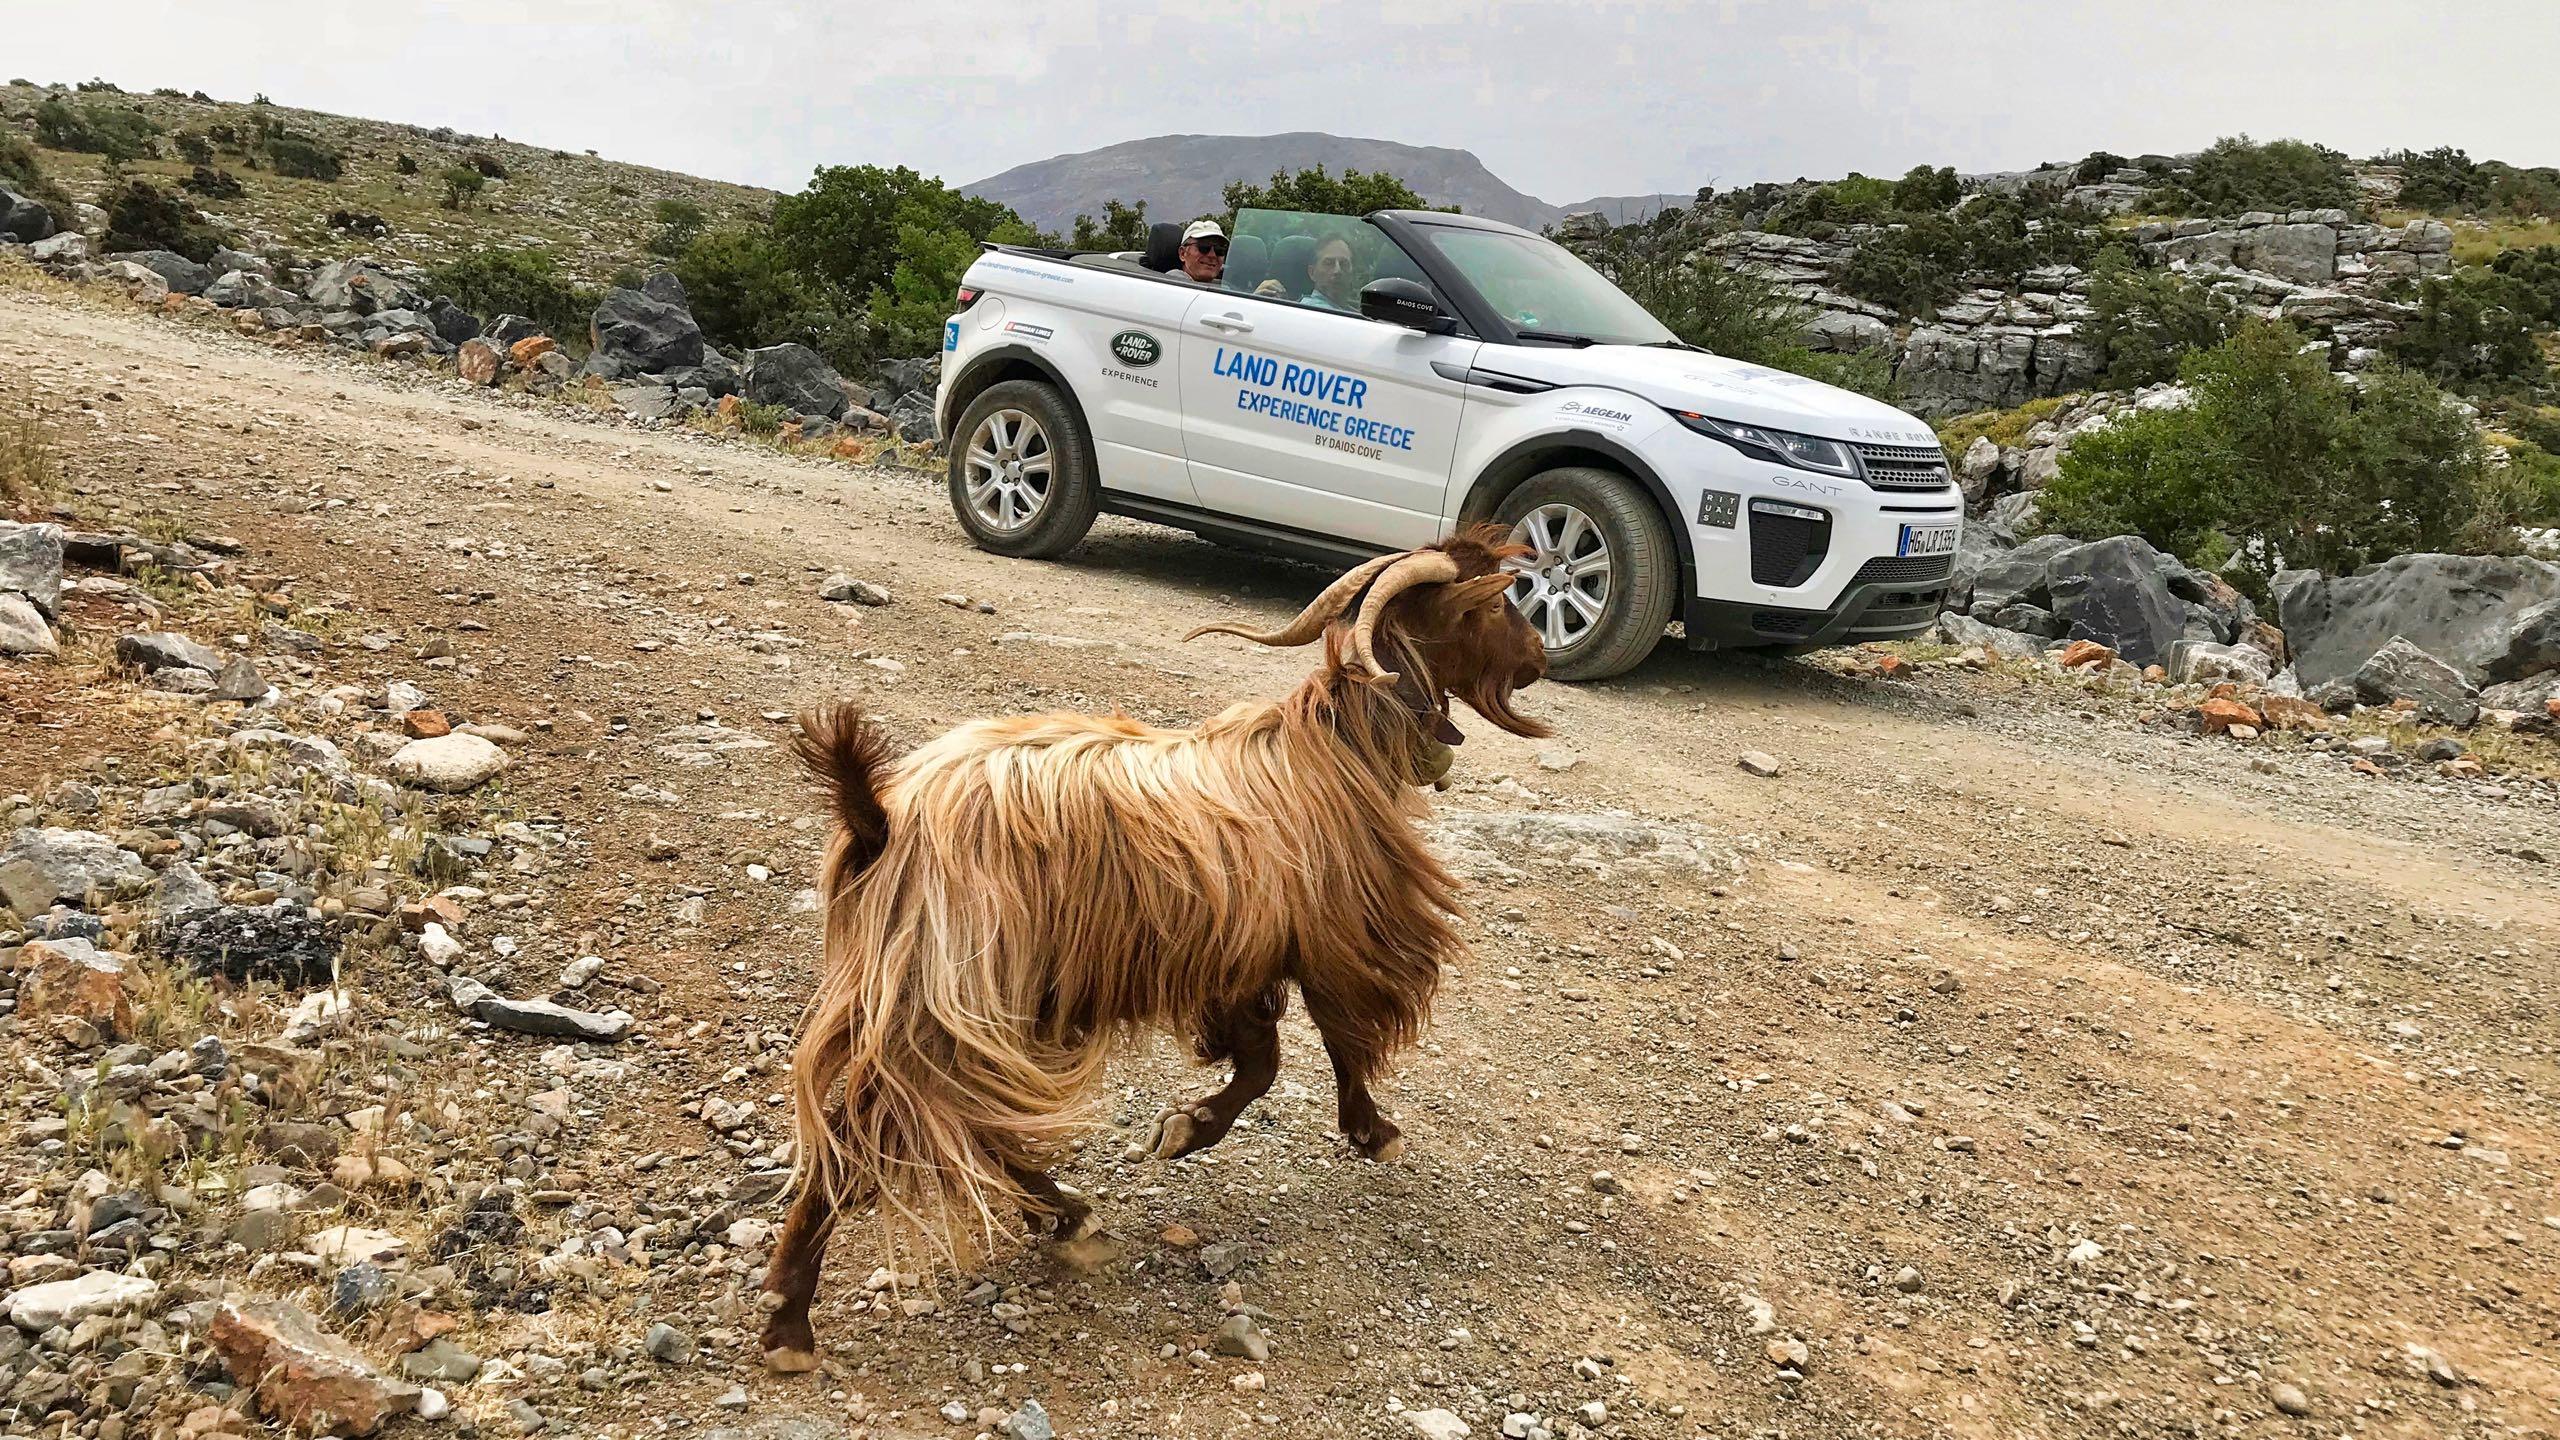 Hotel Daios Cove Kreta Land Rover Experience Greece Tour